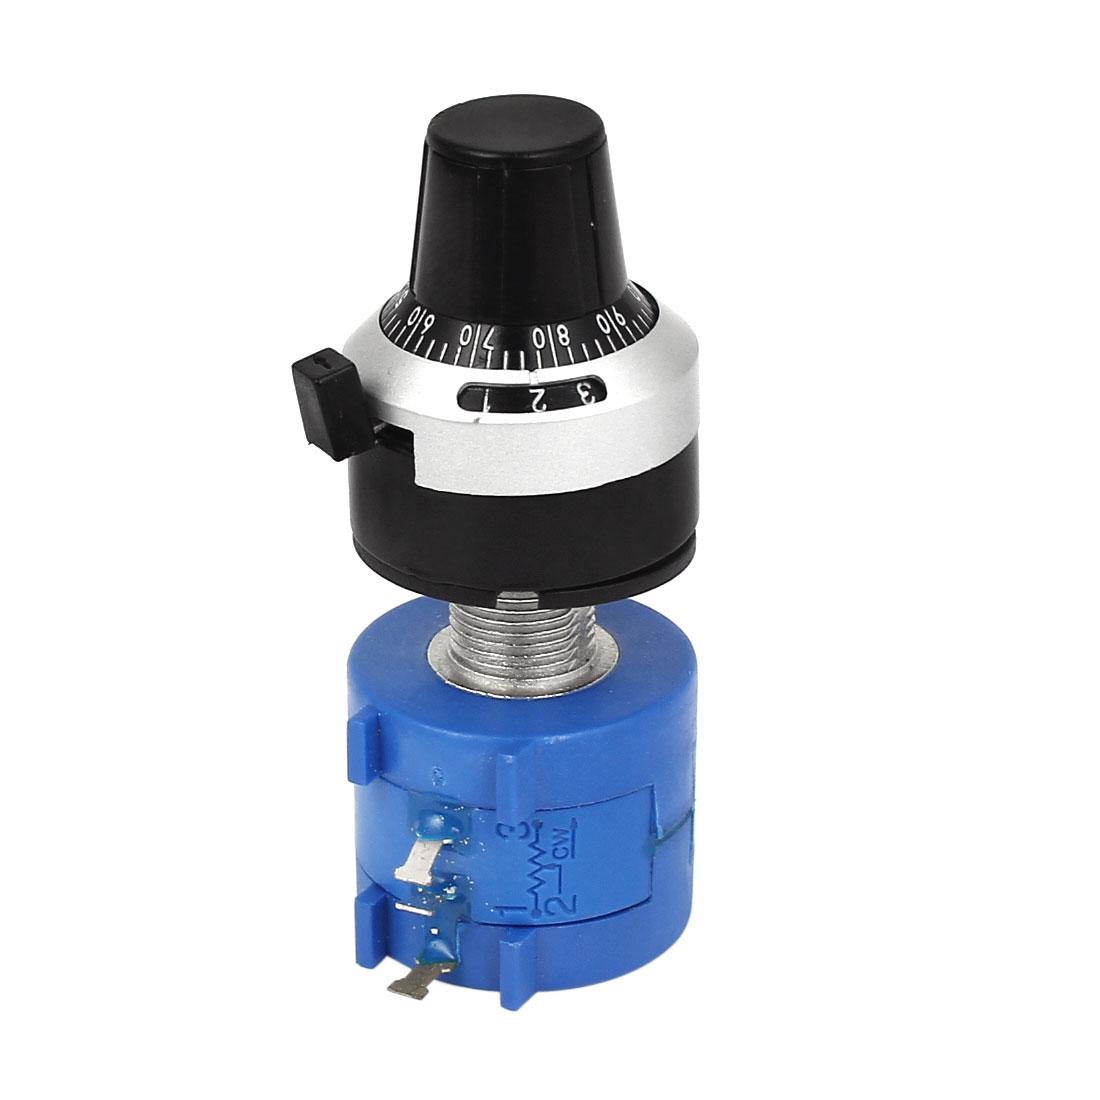 3590S-2-103L 10K Ohm 6mm Shaft 10 Turns Wire Wound Potentiometer w Dial Knob